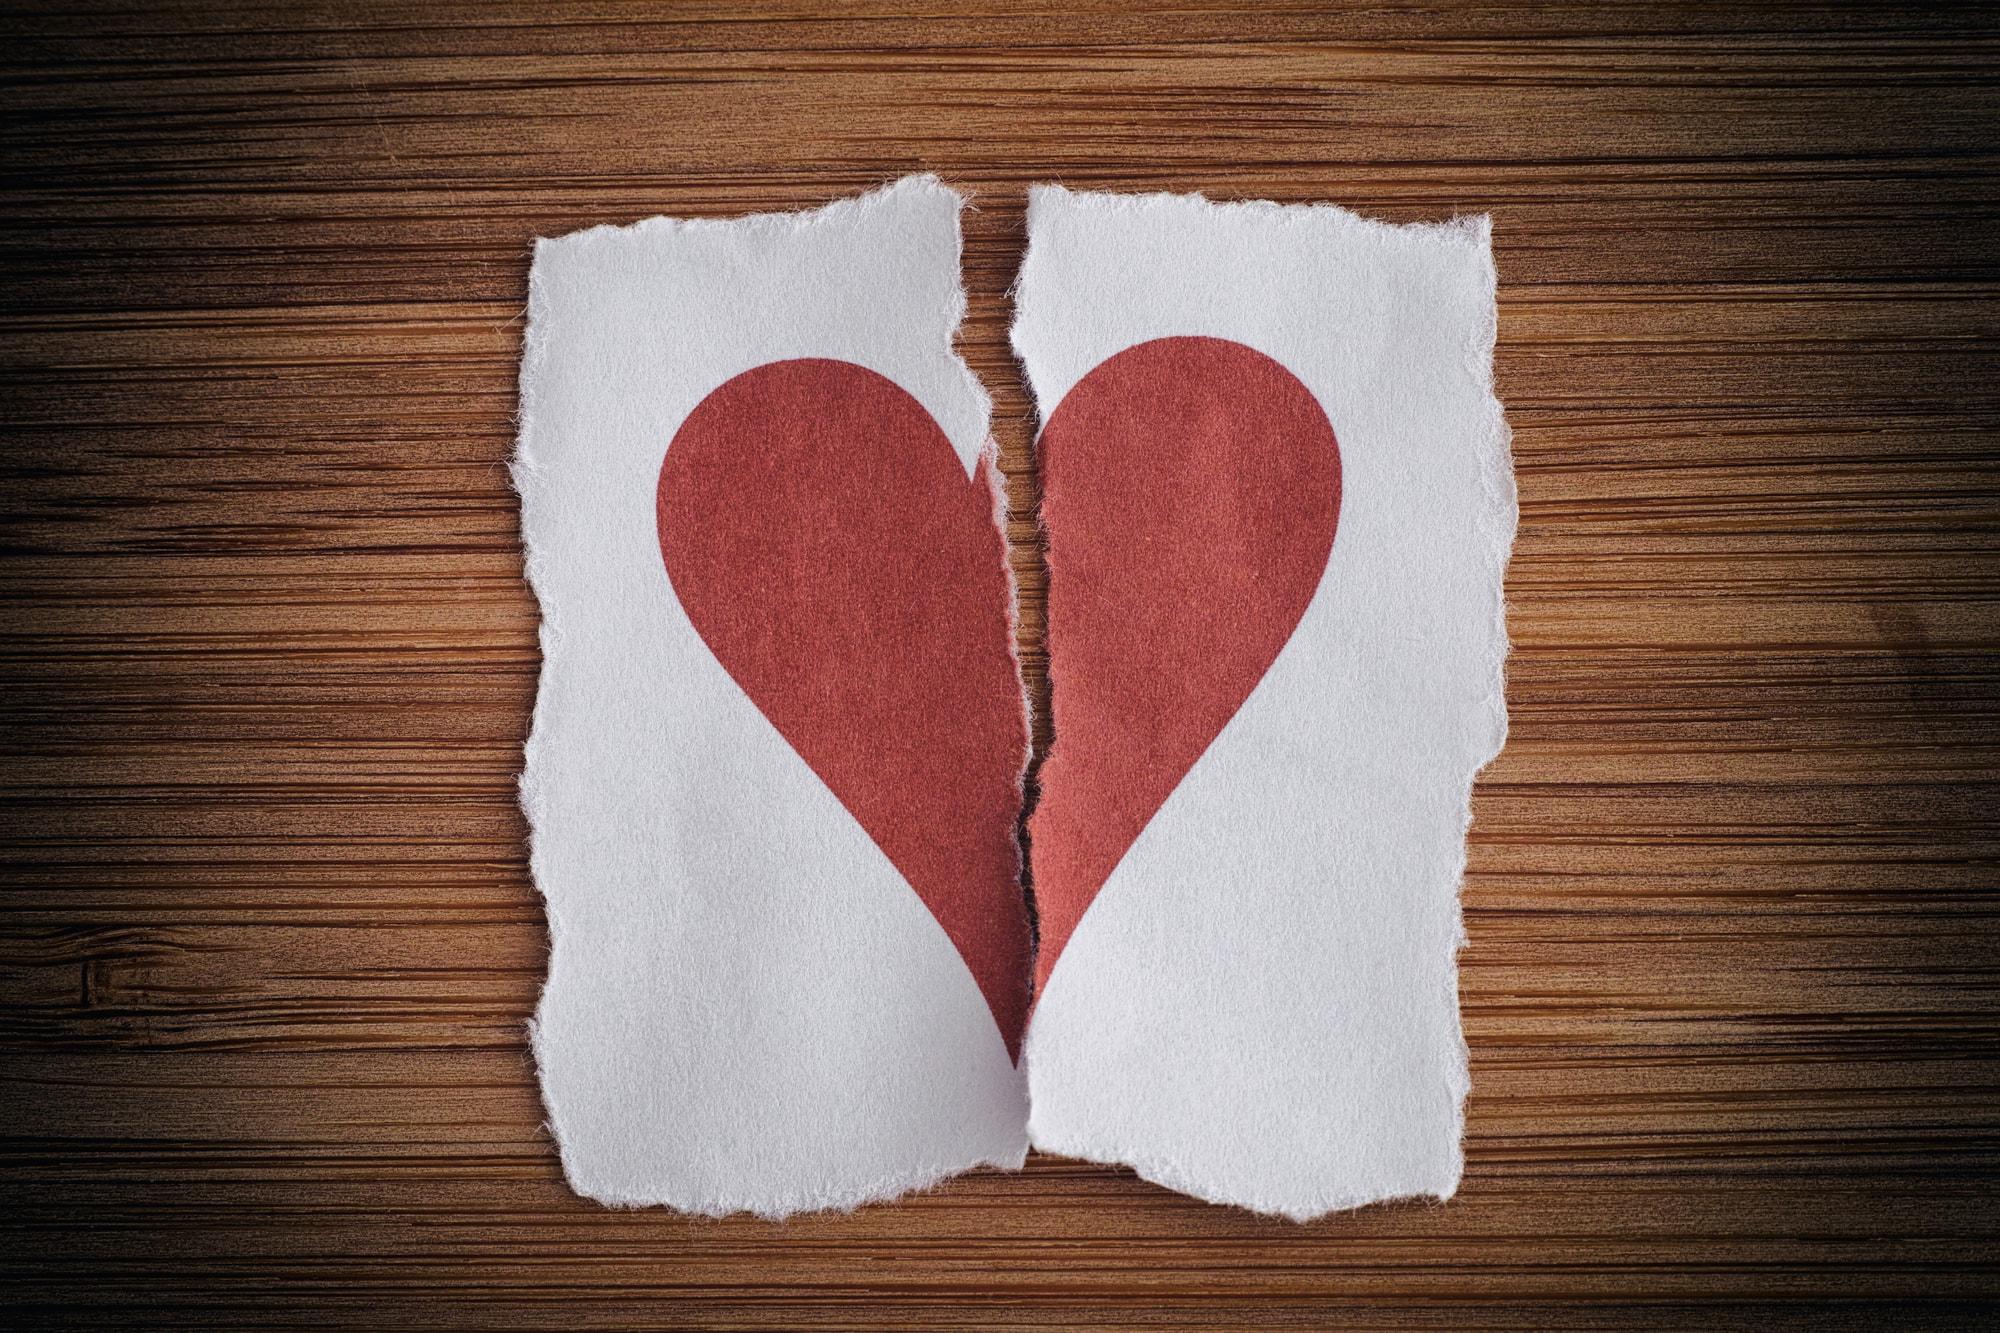 Divorce in June, paper heart ripped in half